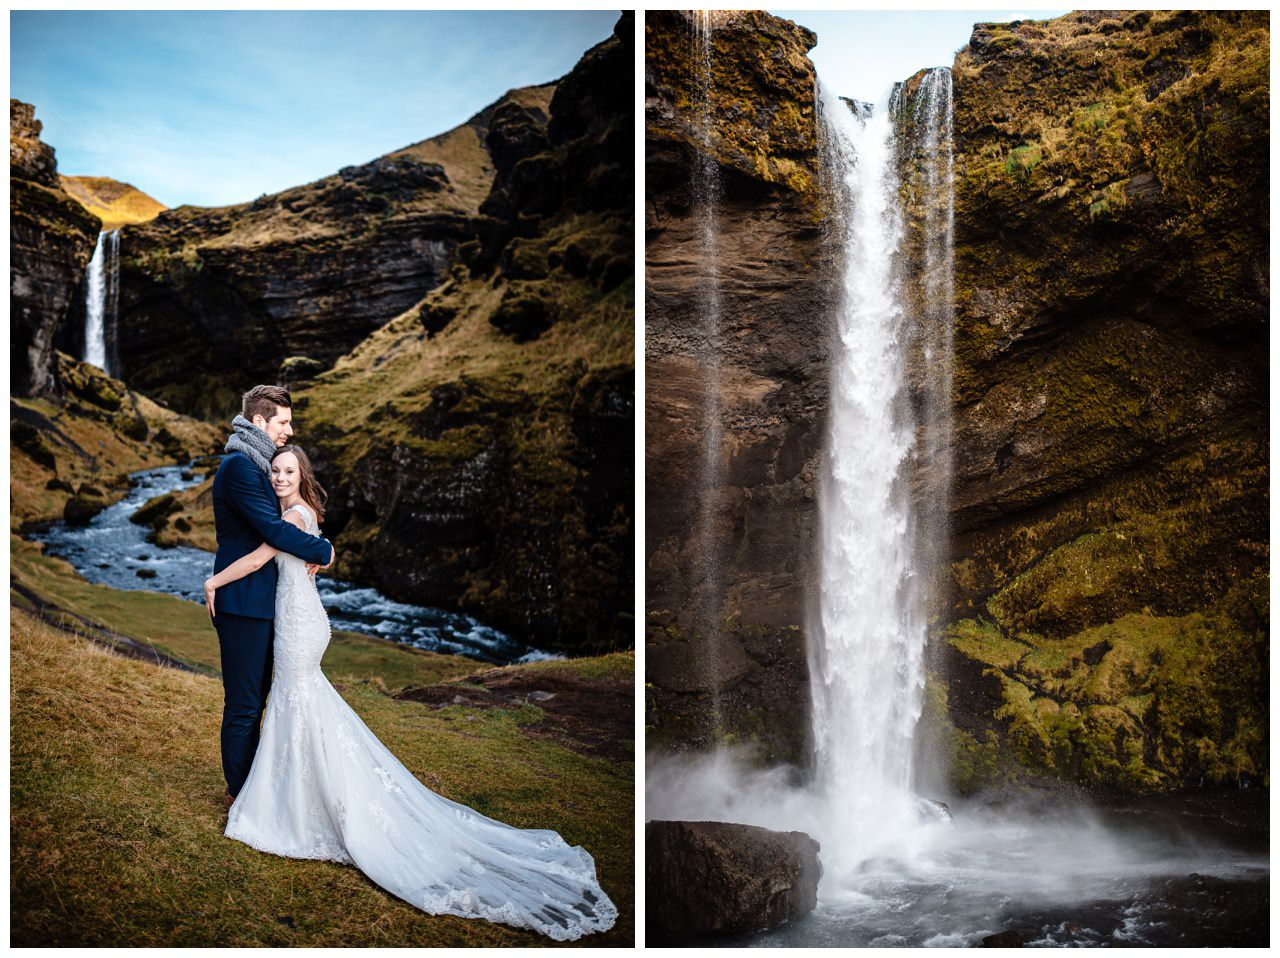 After Wedding Shooting Island Hochzeitsfotos Fotograf 20 - After Wedding Shooting auf Island